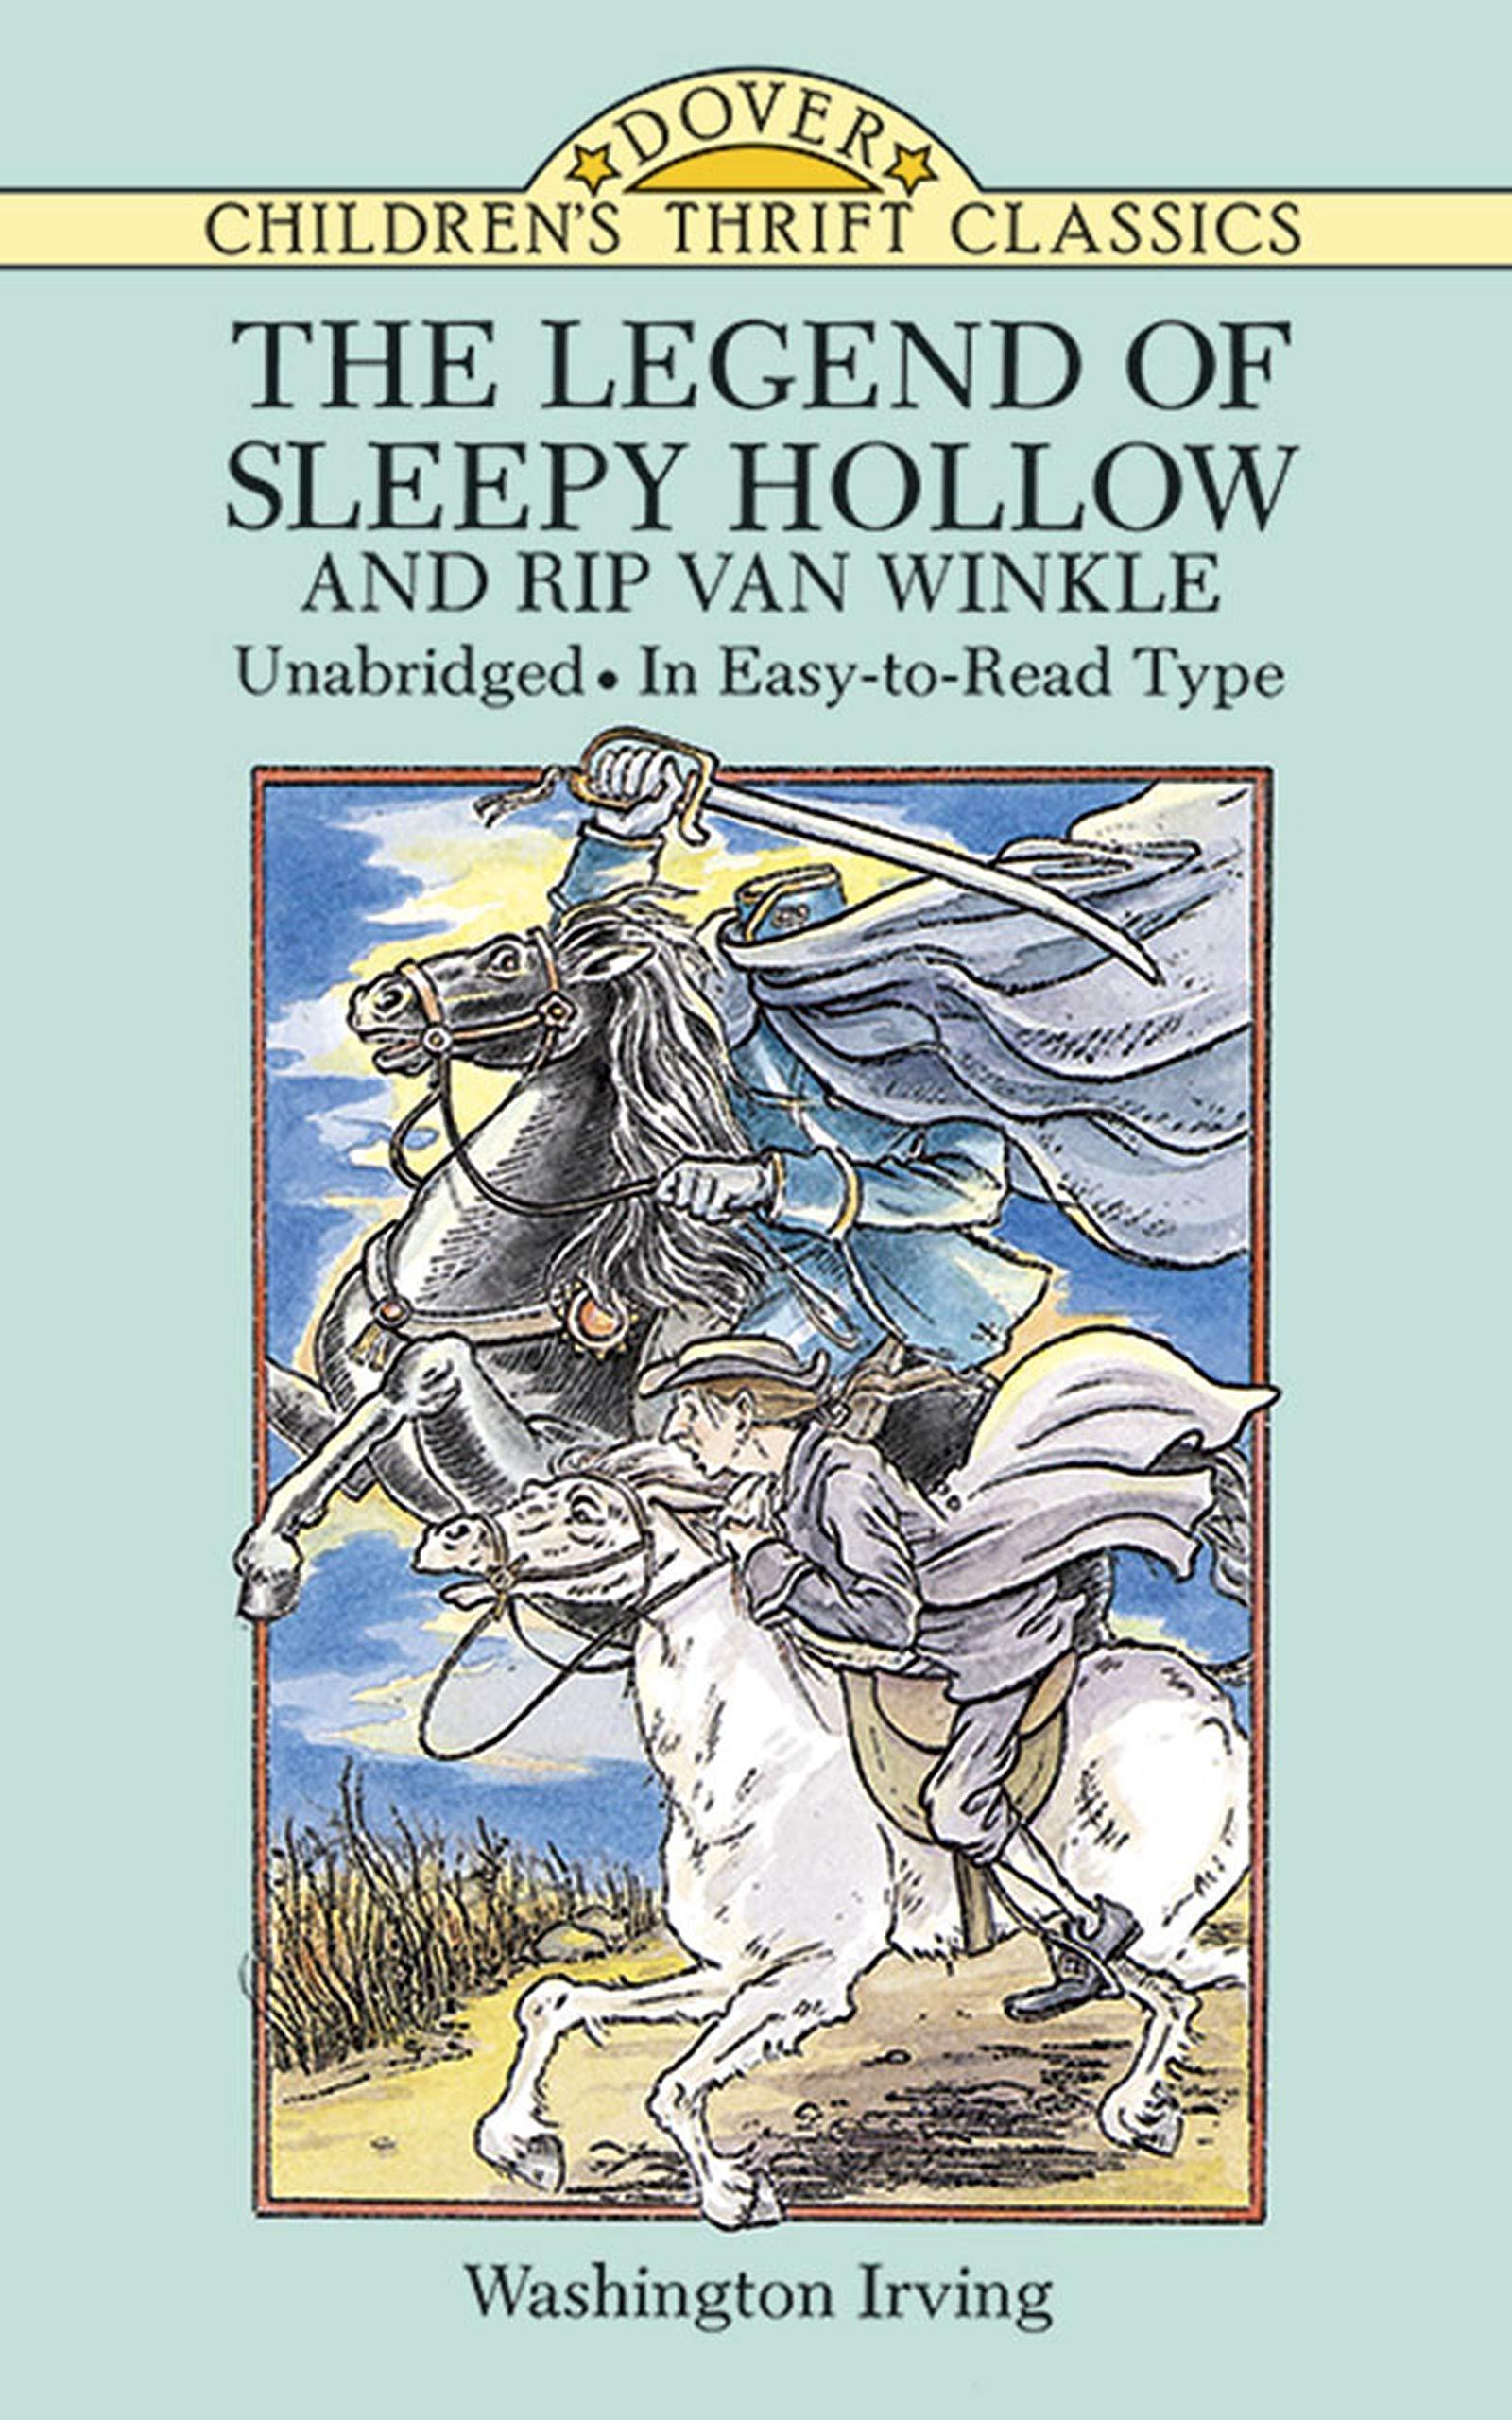 The Legend of Sleepy Hollow Dover Childrens Thrift Classics: Amazon.es: Irving, Washington: Libros en idiomas extranjeros